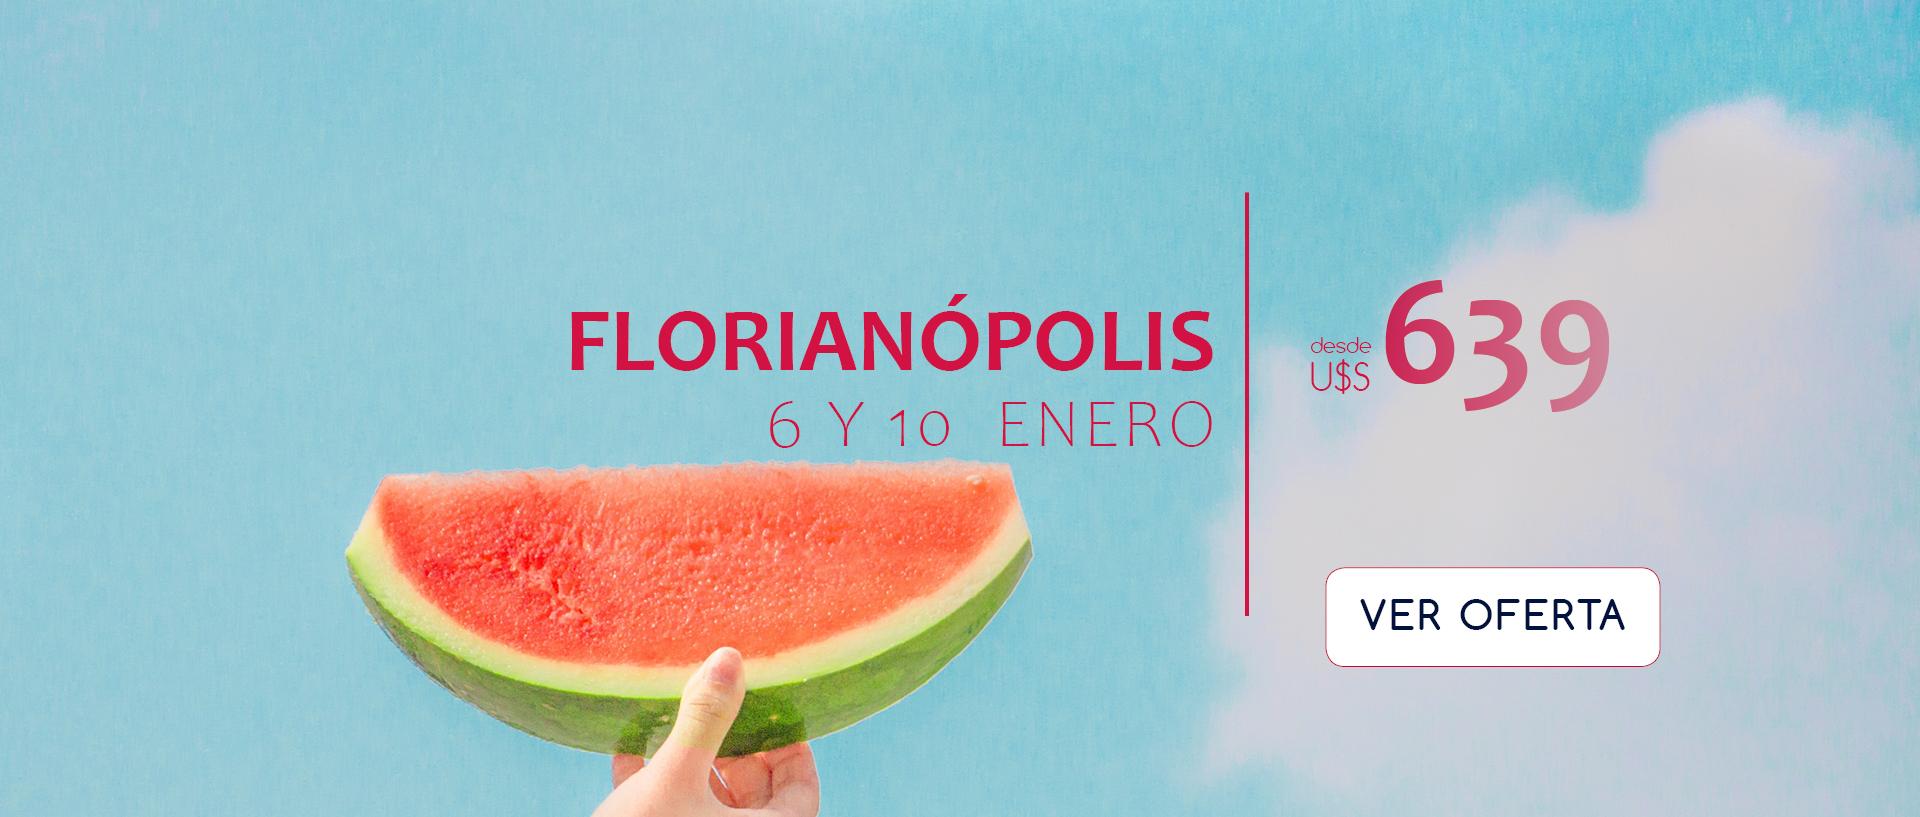 Florianopolis verano